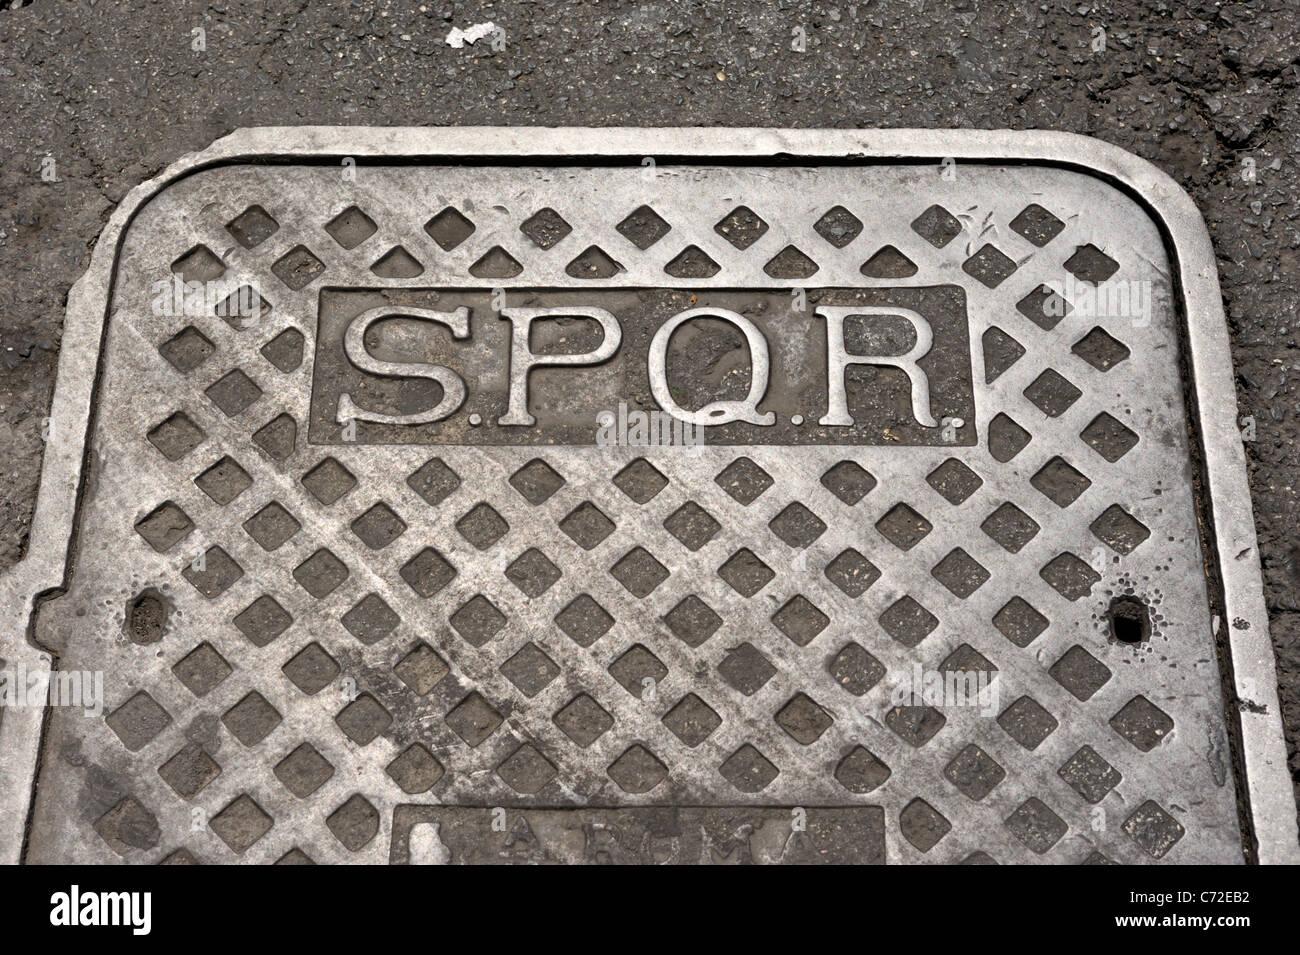 italy, rome, SPQR manhole cover - Stock Image